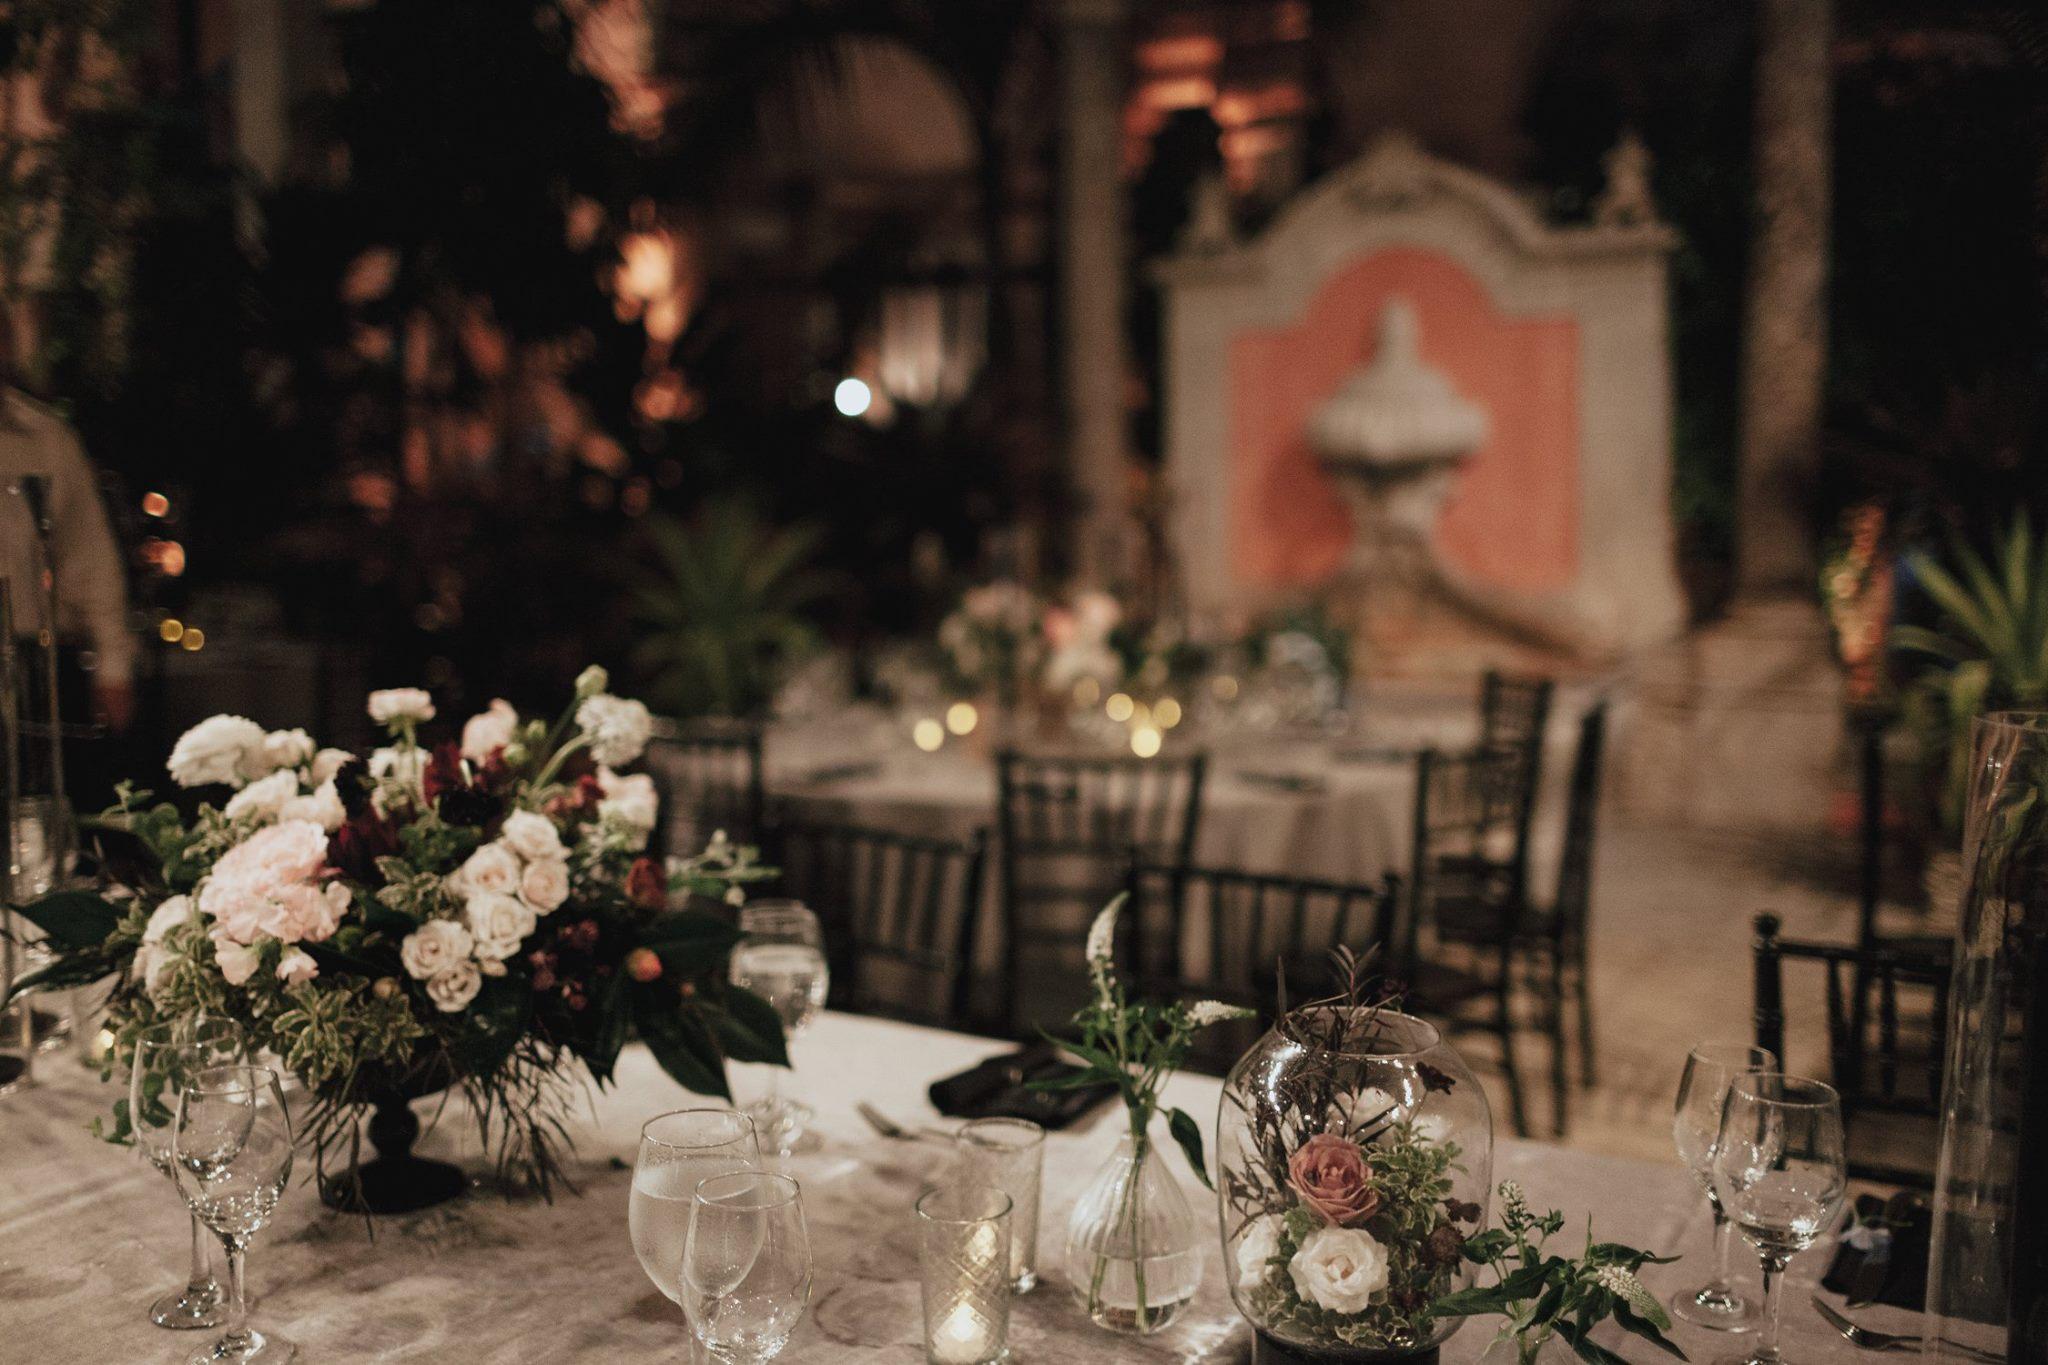 Catering Luxury Destination Wedding in Miami 4.jpg